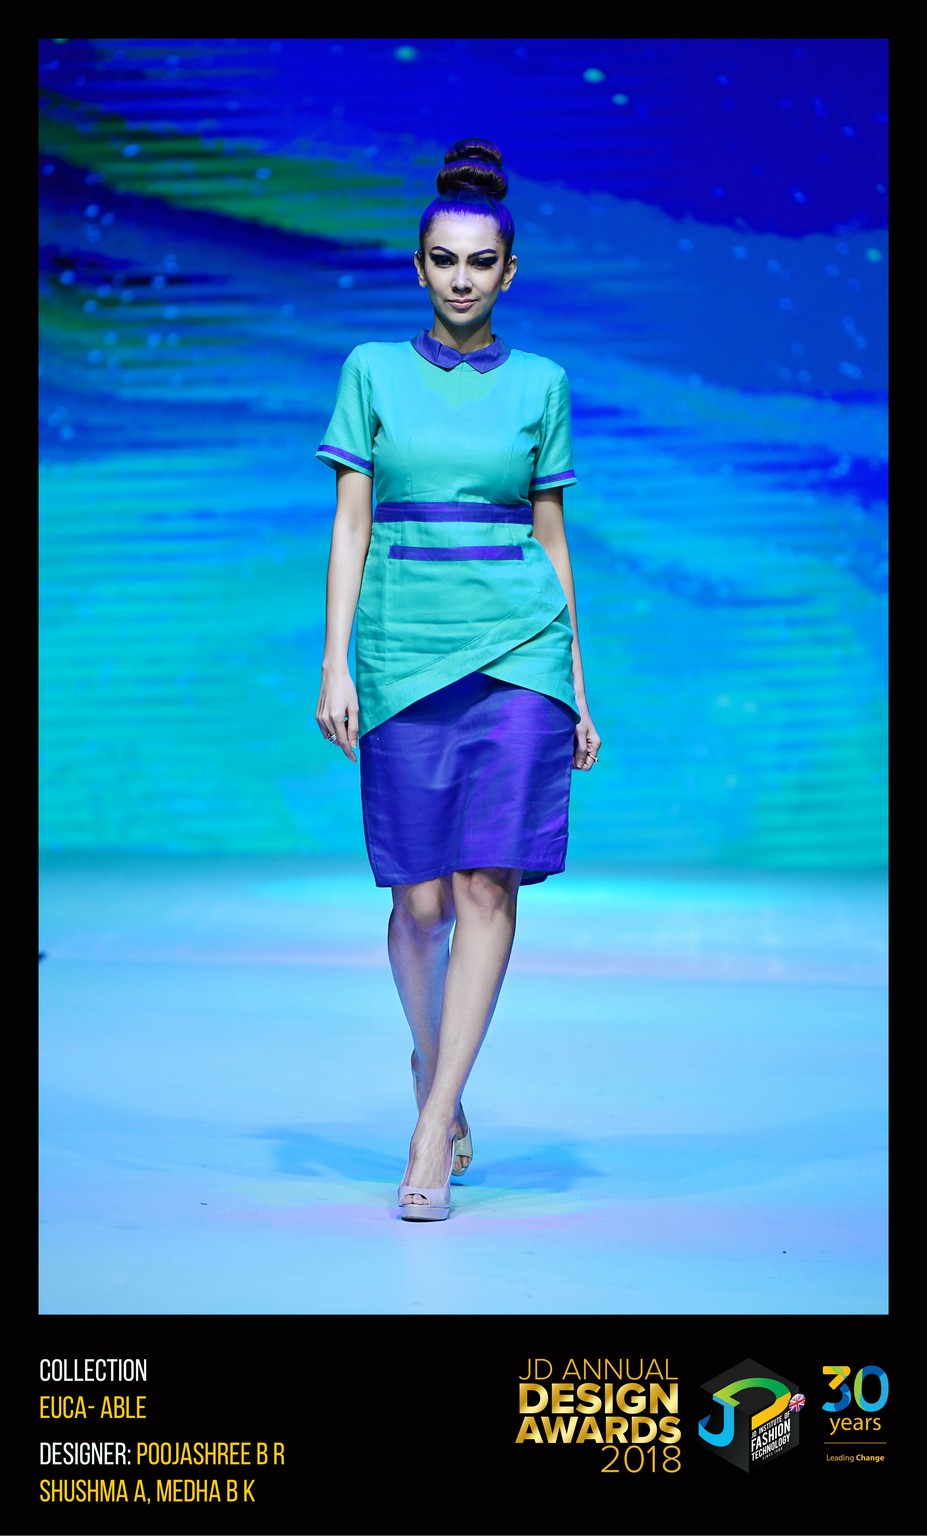 Euca-able – Change – JD Annual Design Awards 2018 | Designer: Poojashree, Sushma and Medha | Photography : Jerin Nath (@jerin_nath) euca-able – change – jd annual design awards 2018 - EUCA ABLE 1 - Euca-able – Change – JD Annual Design Awards 2018